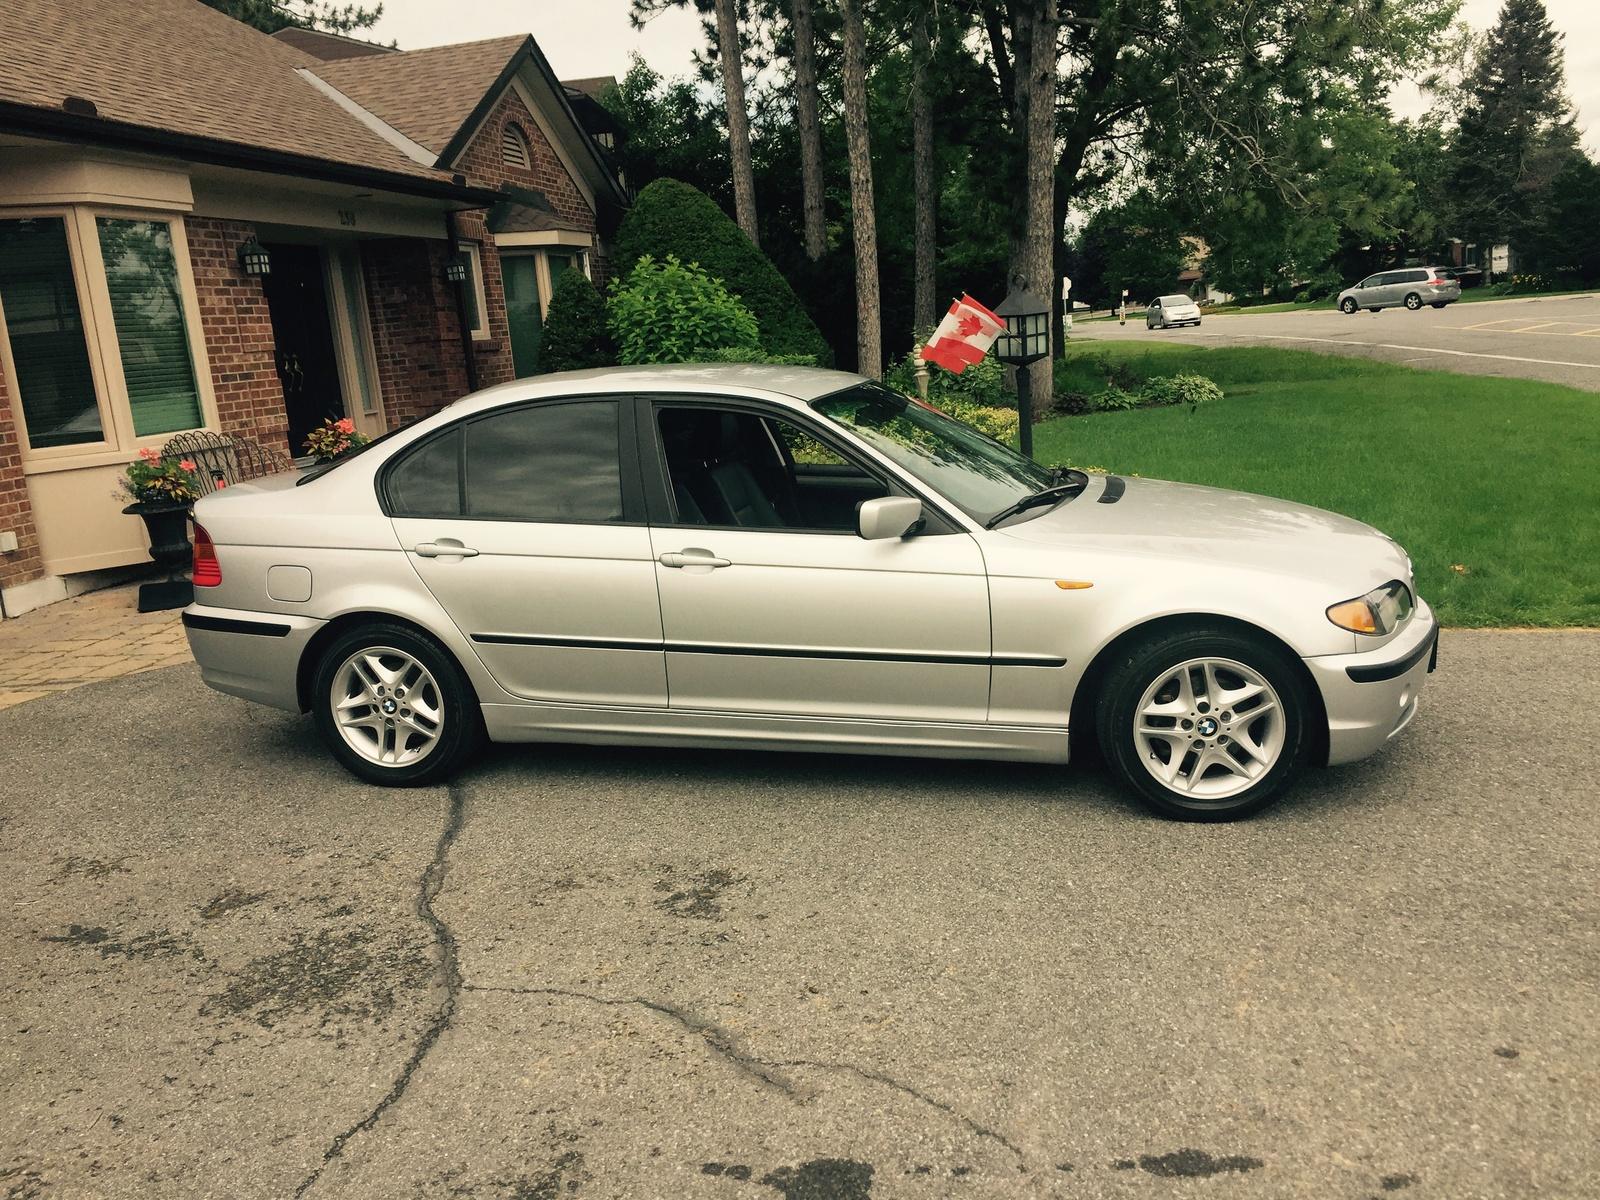 BMW Series Questions How Do I List My Car CarGurus - Bmw 3 series list